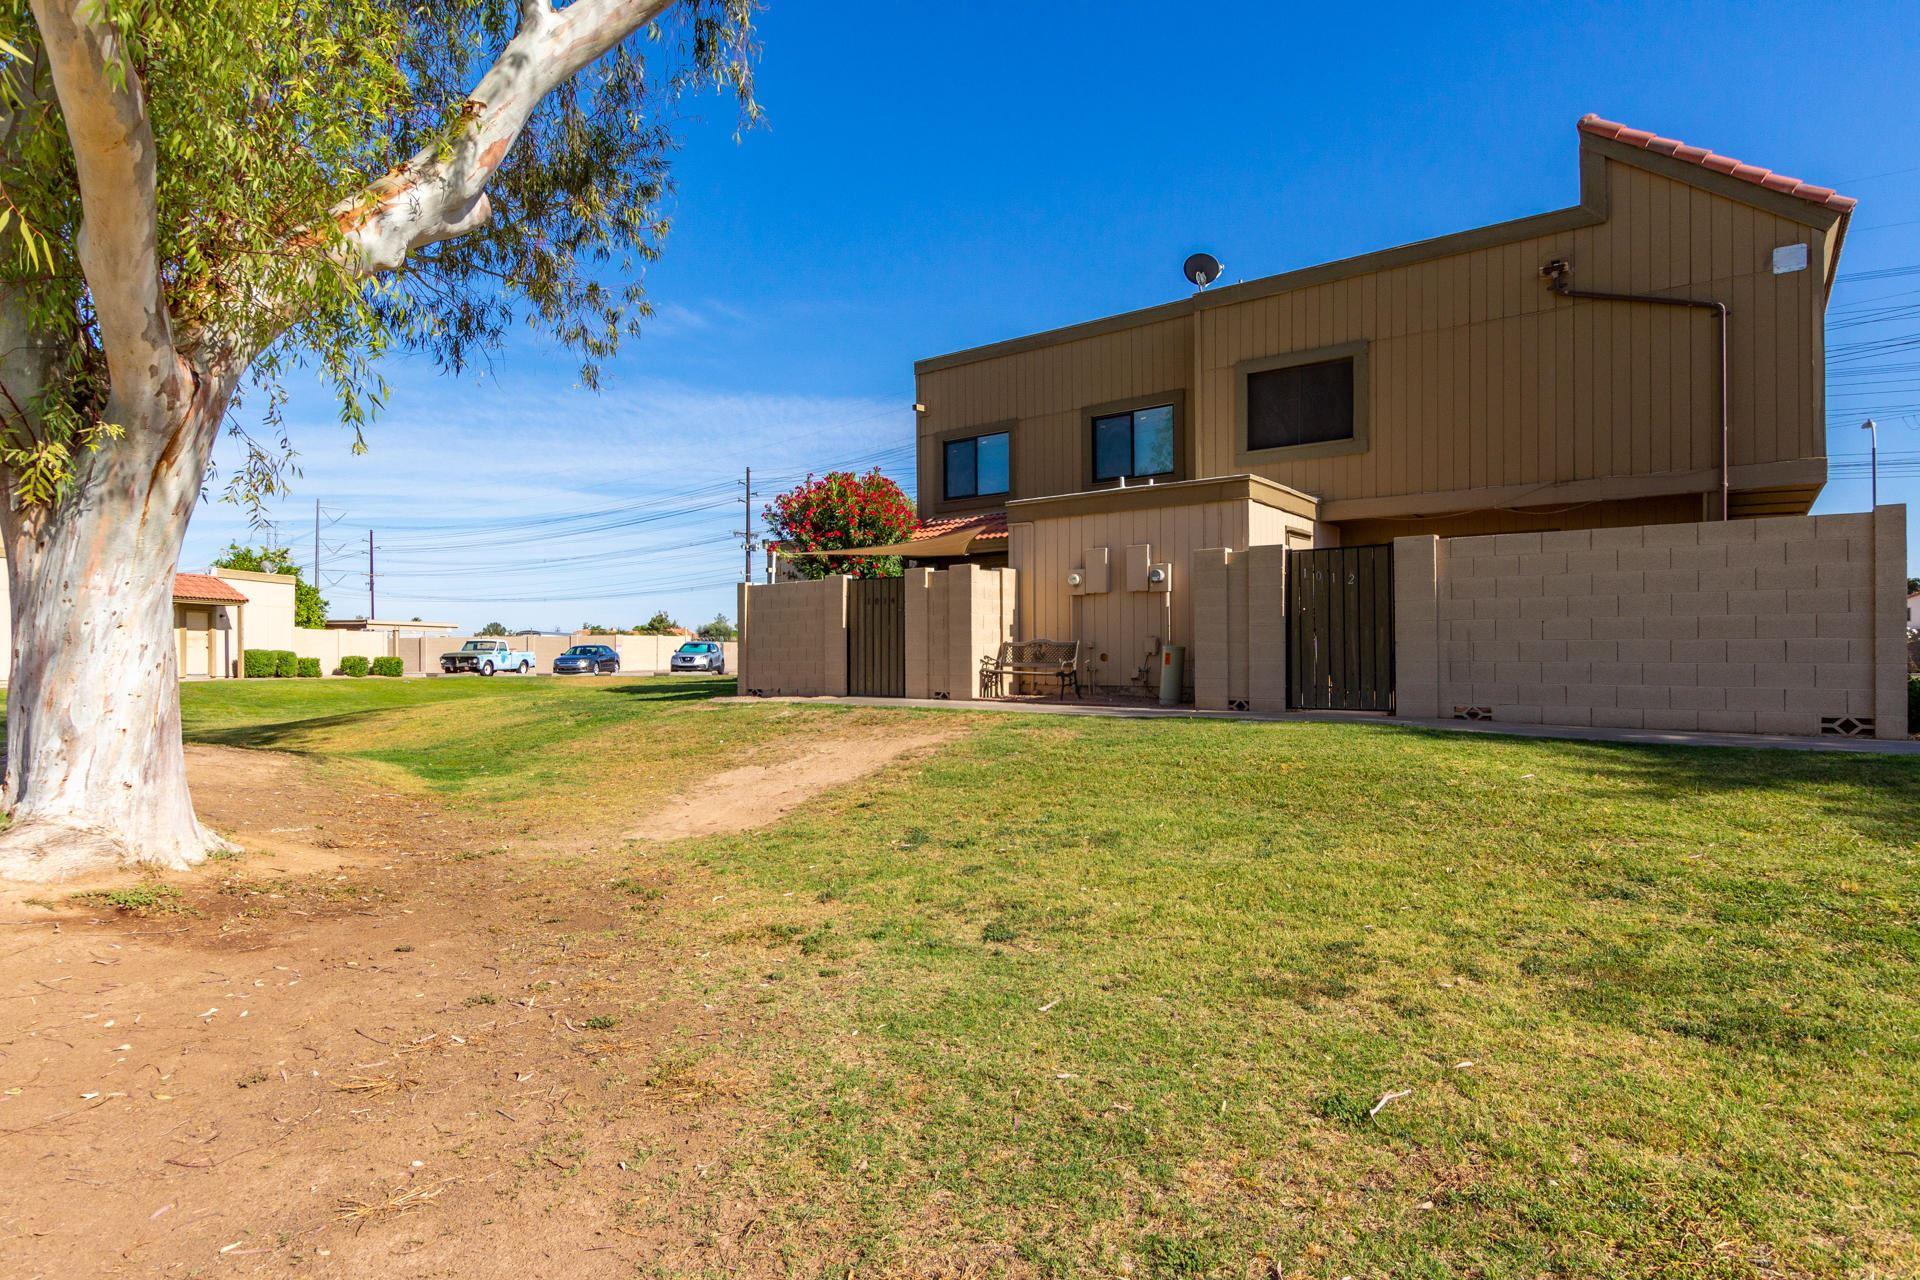 Photo of 1014 E DIAMOND Drive, Tempe, AZ 85283 (MLS # 6233674)